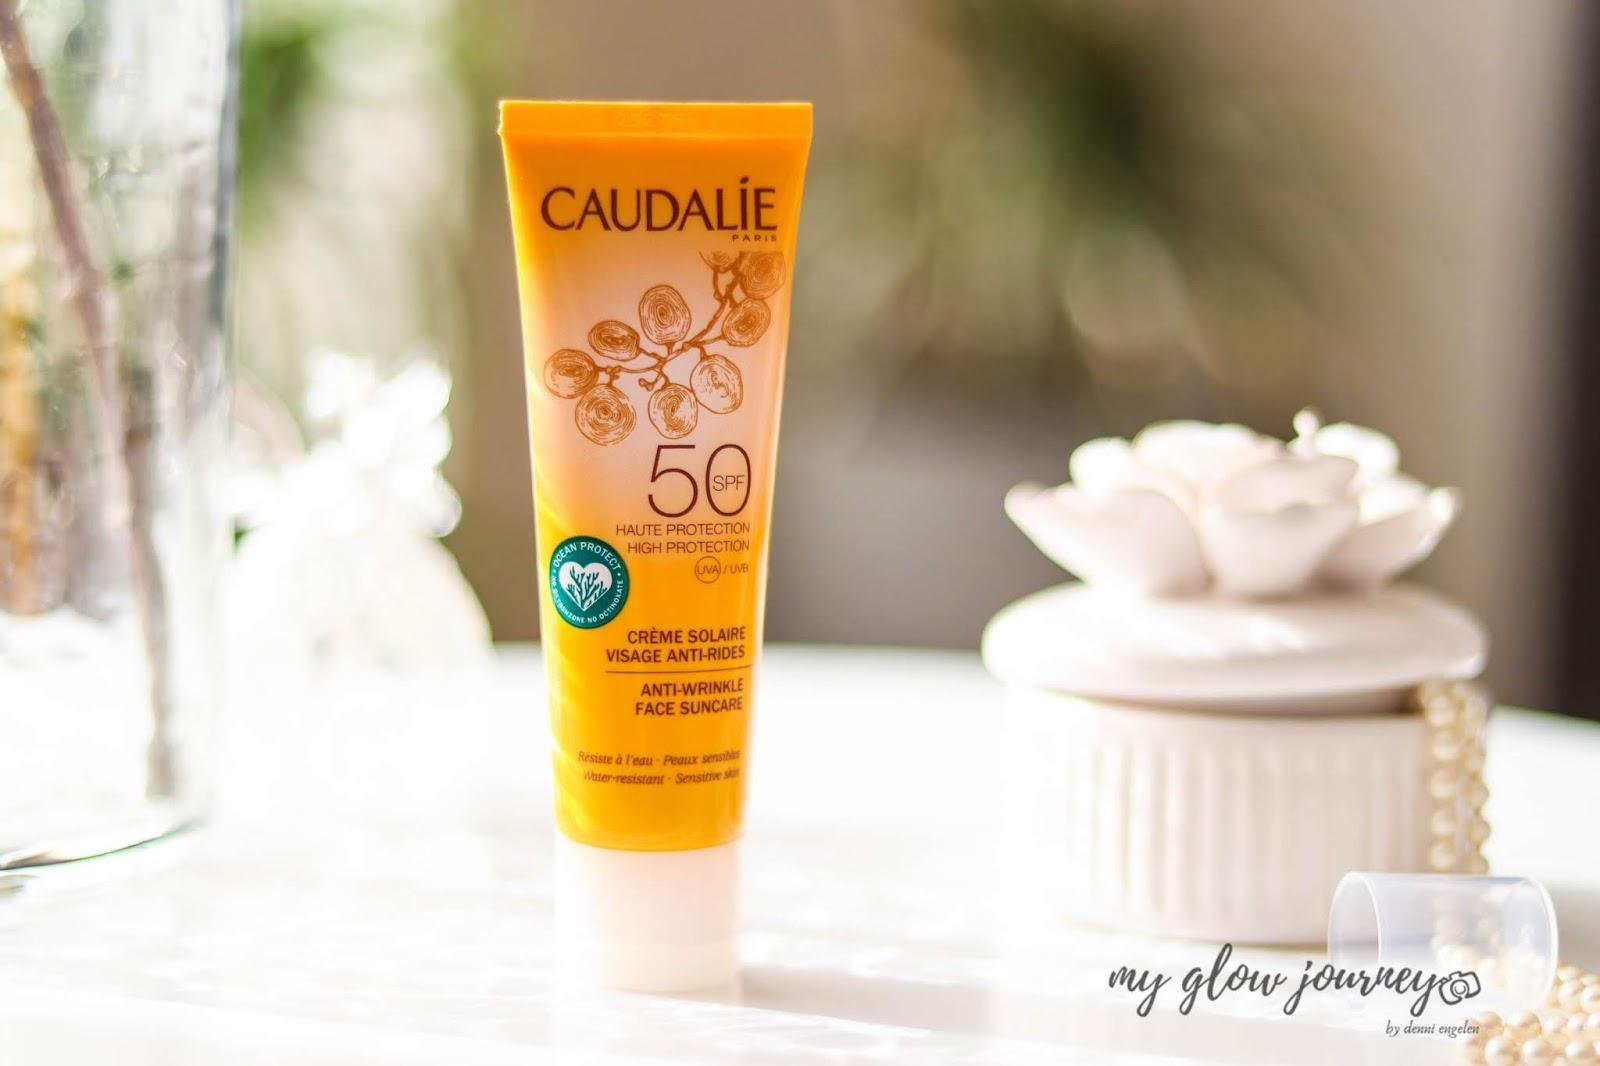 Caudalie Anti-wrinkle Face Suncare SPF50 Review